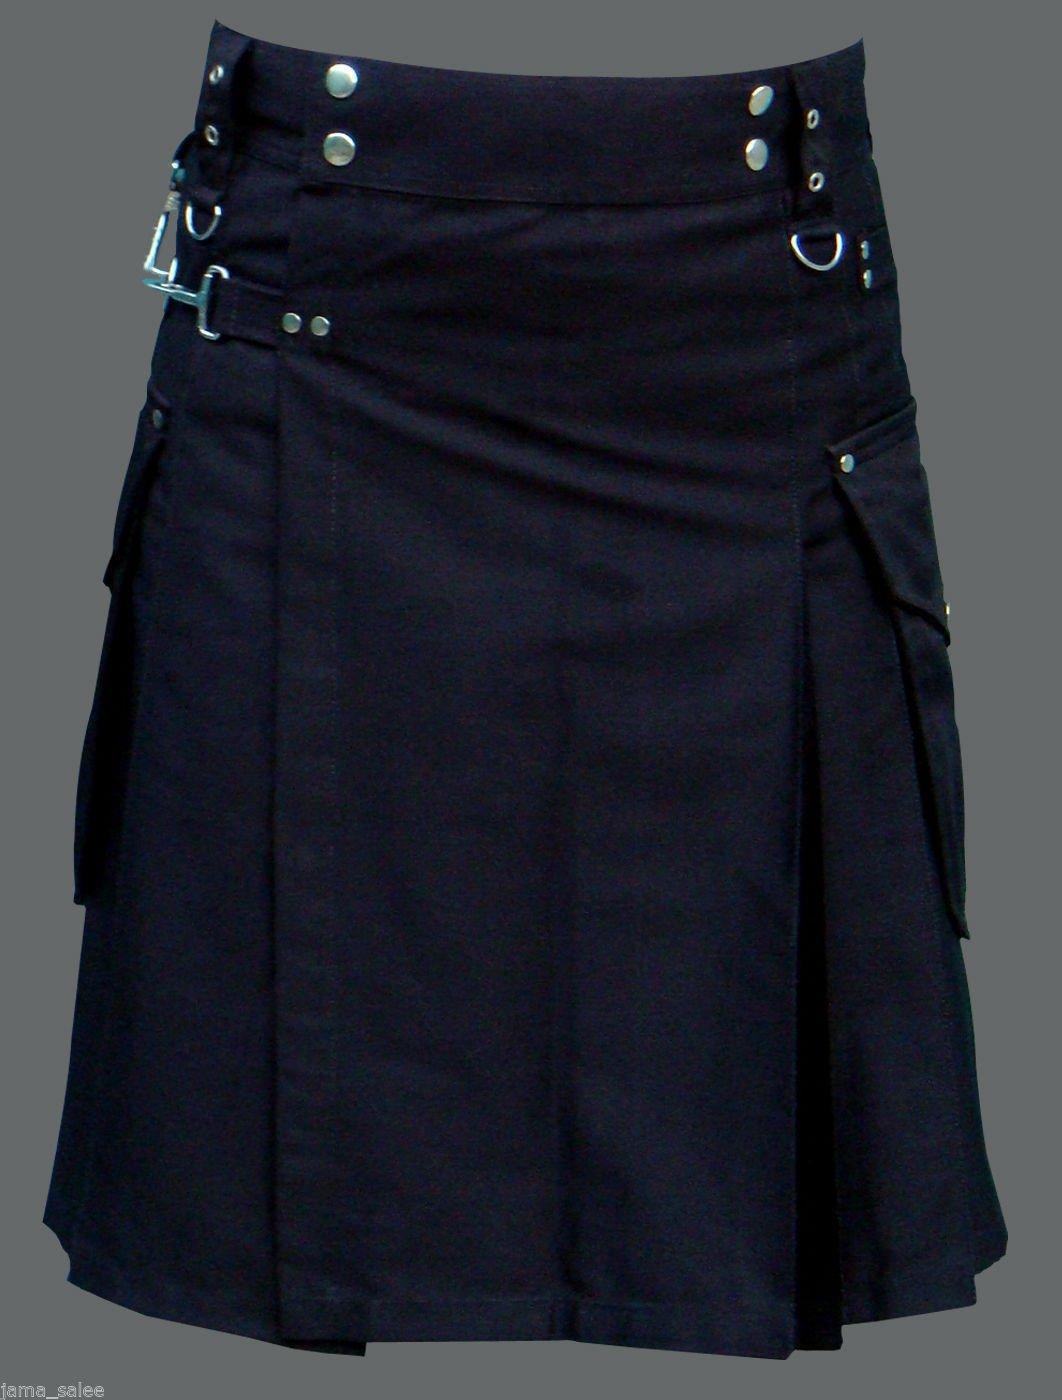 Men 30 Waist Handmade Black Deluxe Utility Kilt 100% Cotton With Cargo Pockets